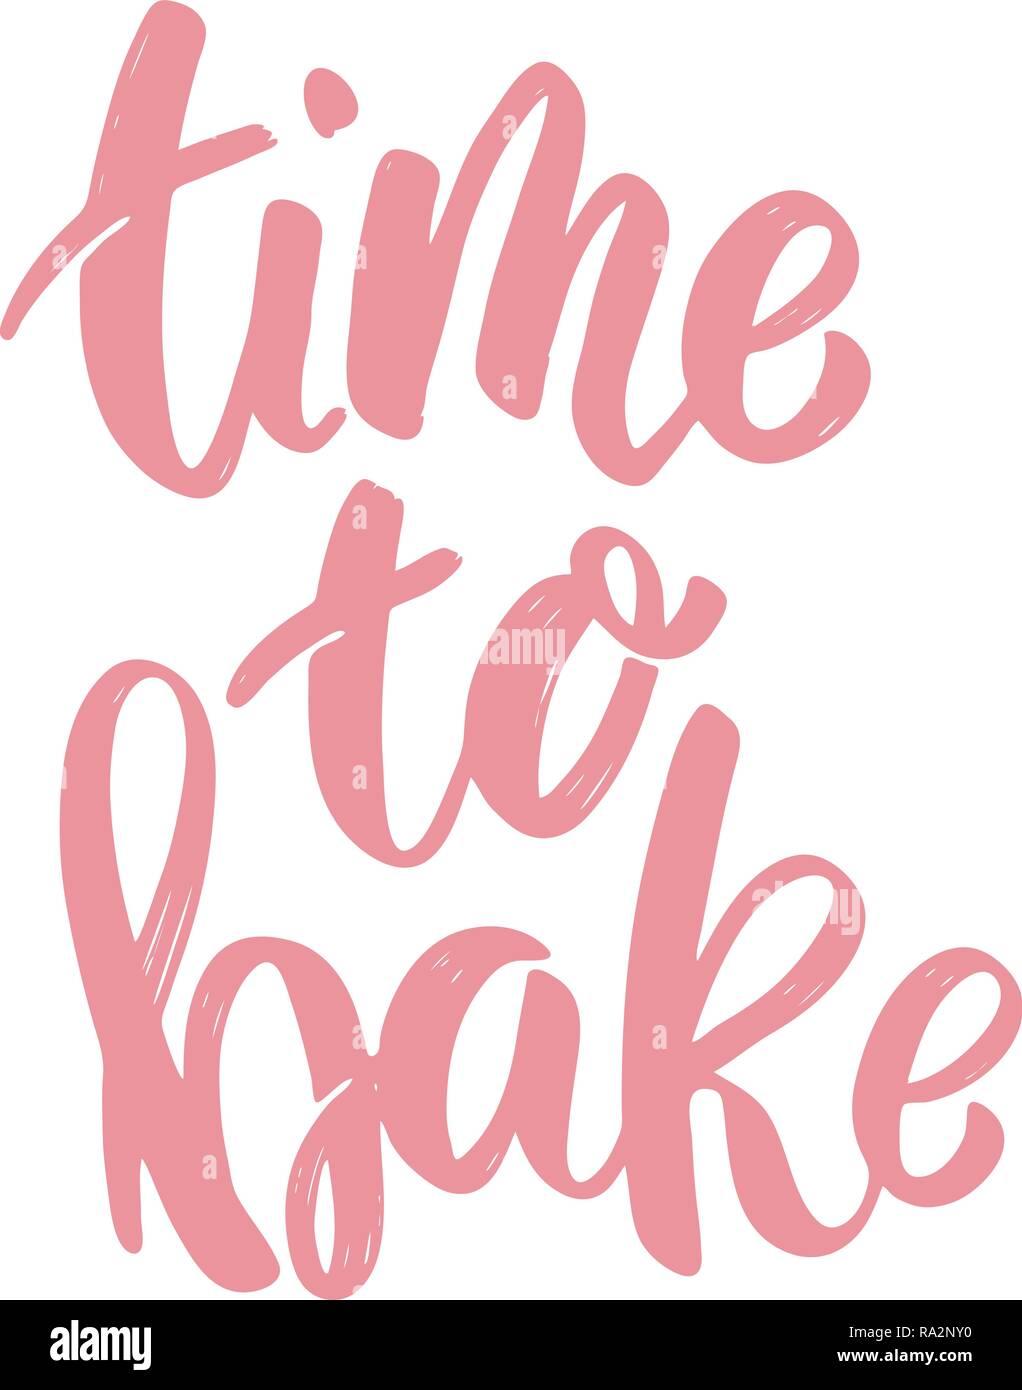 Time to bake  lettering phrase on white background  Design